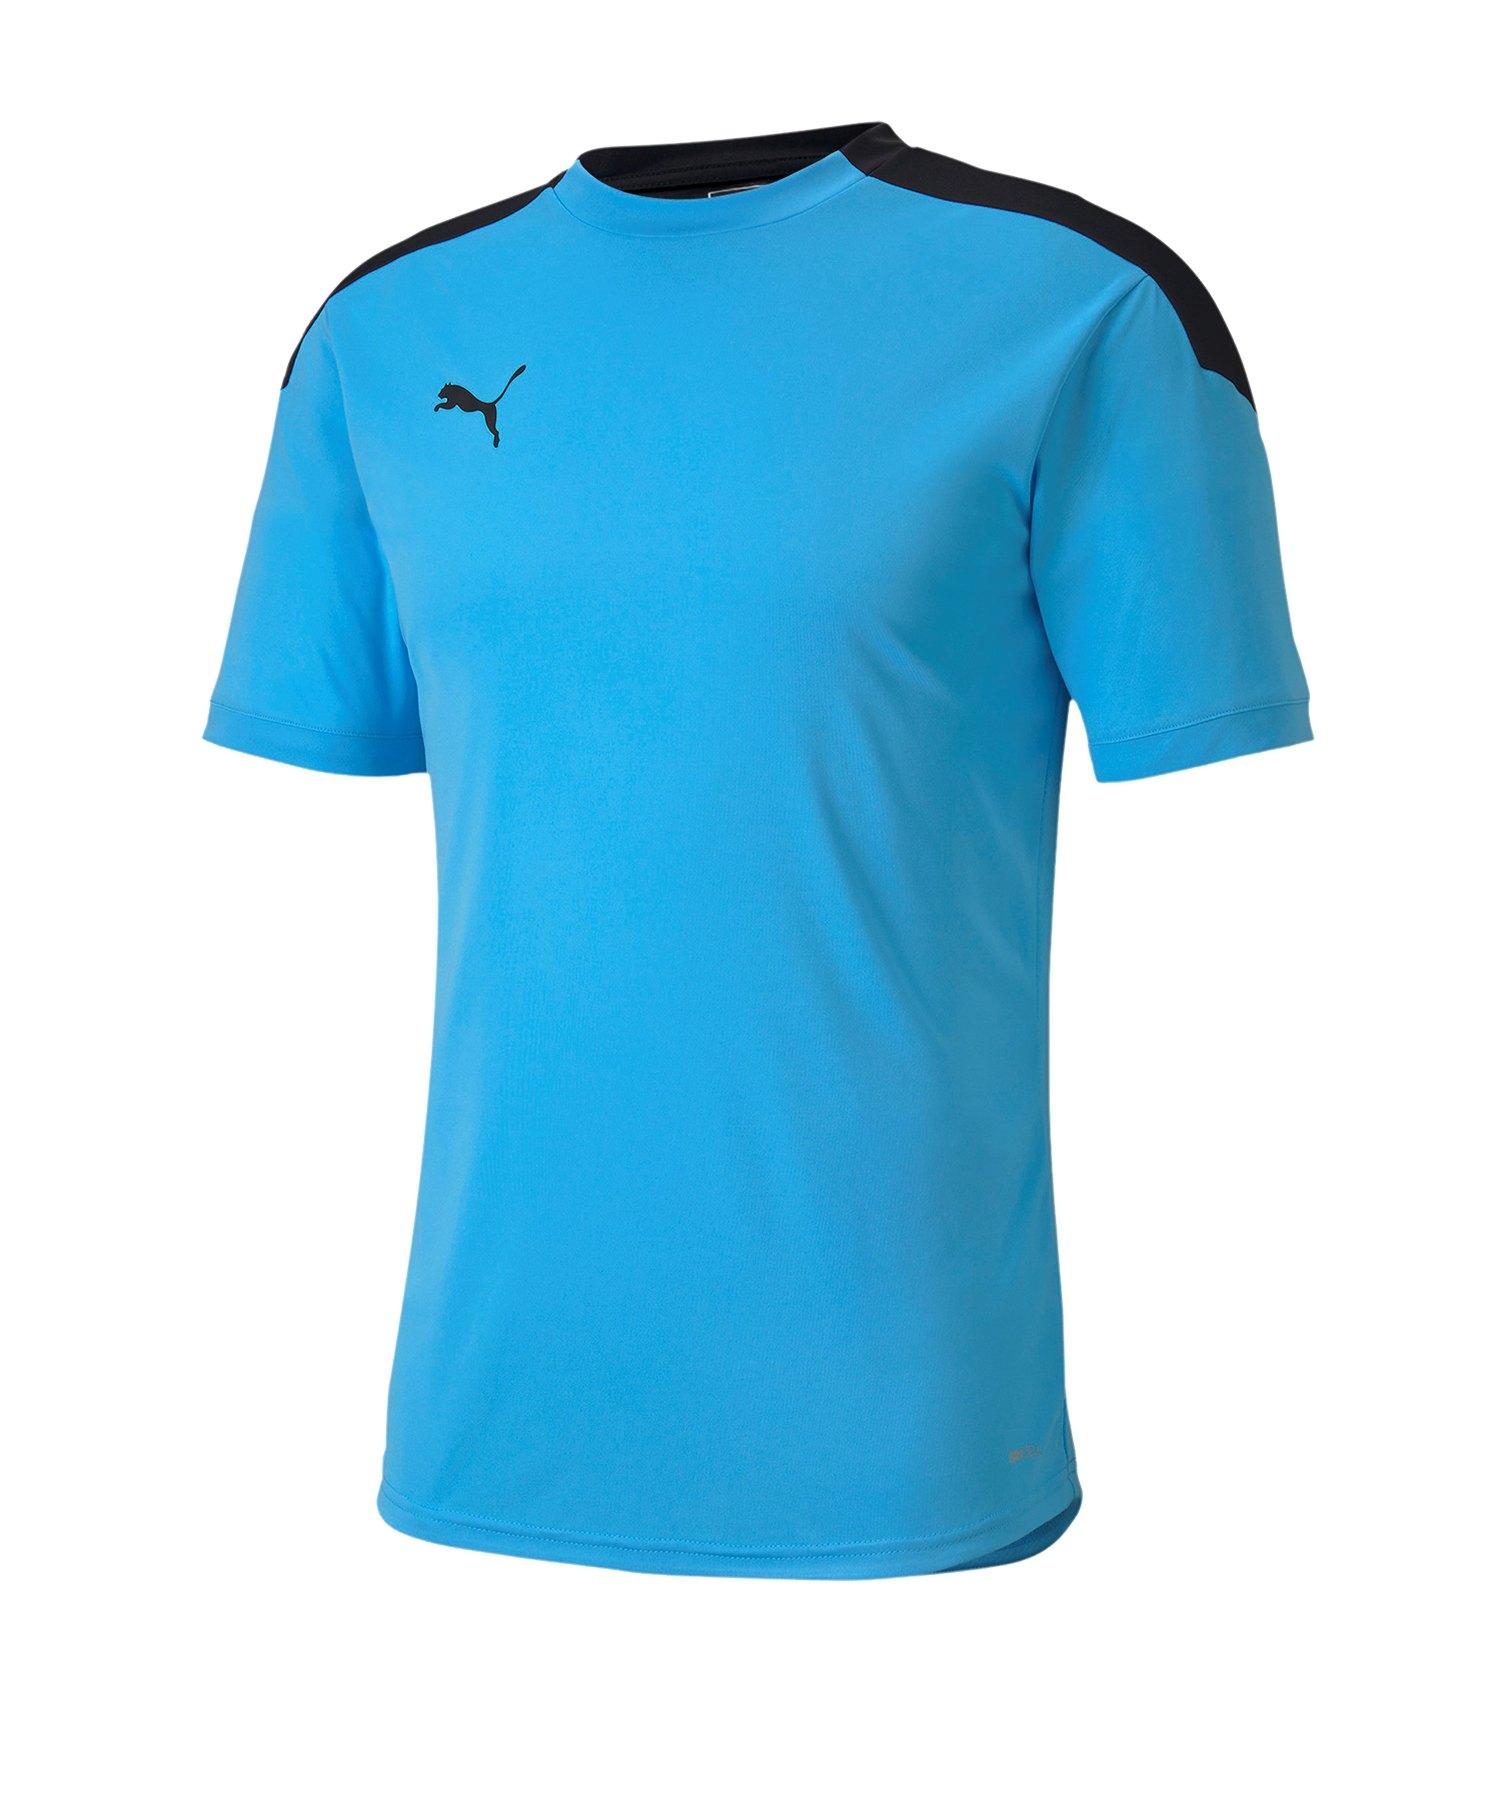 PUMA ftblNXT Trainingsshirt Kids Blau Schwarz F02 - blau